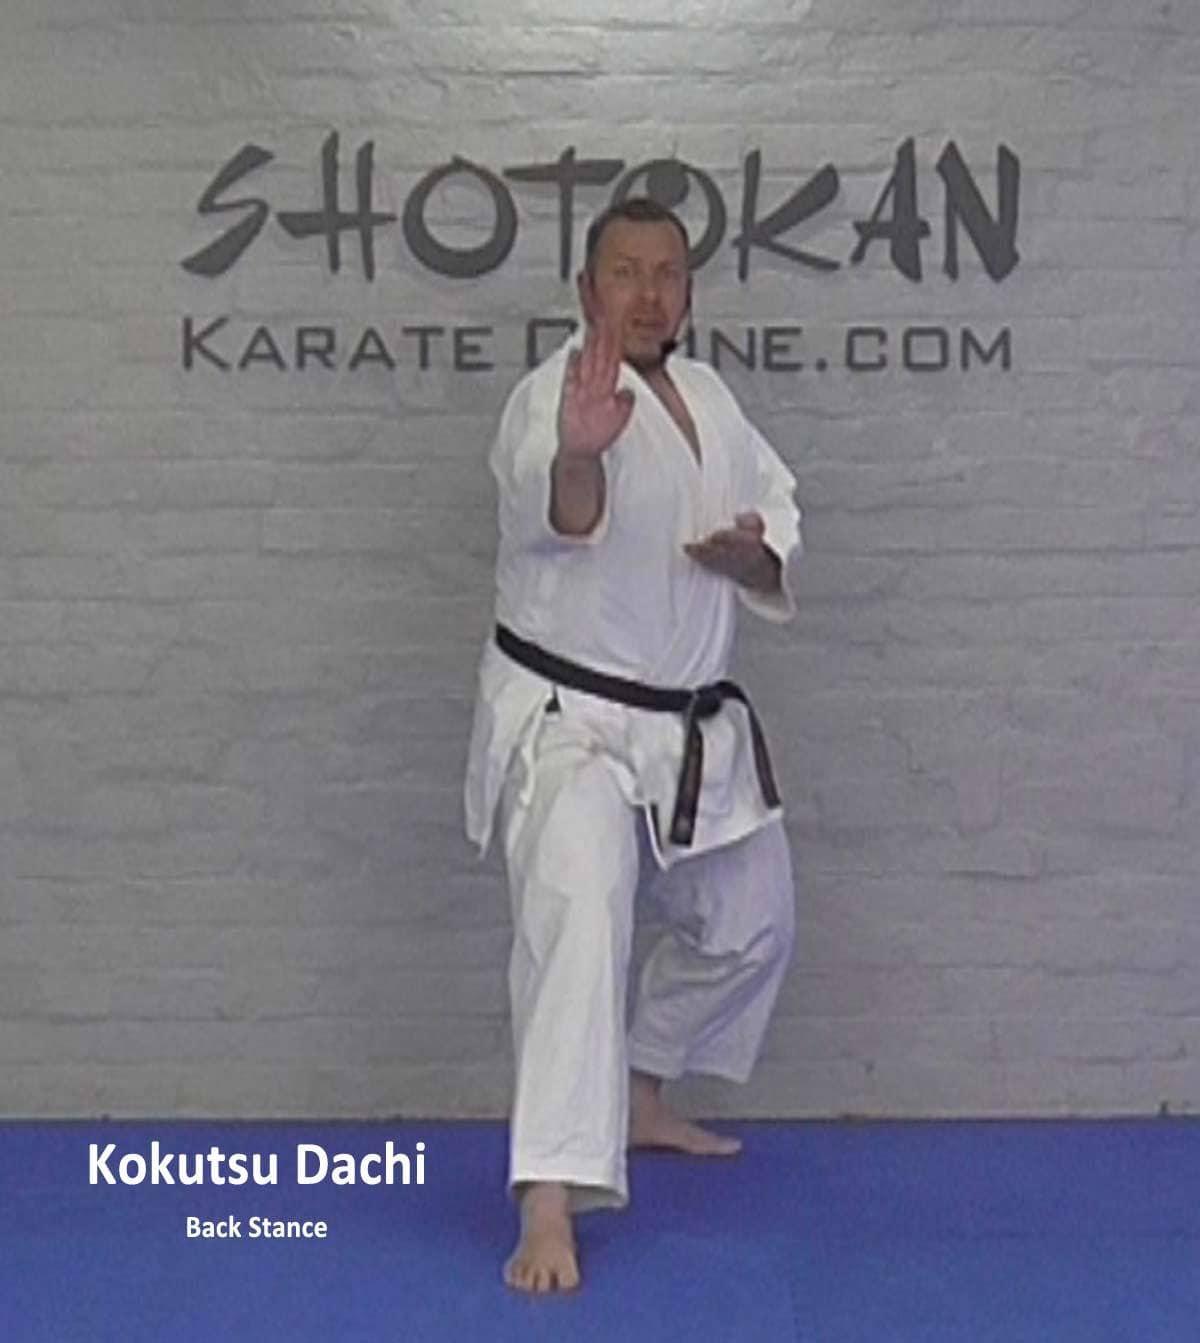 shotokan back stance